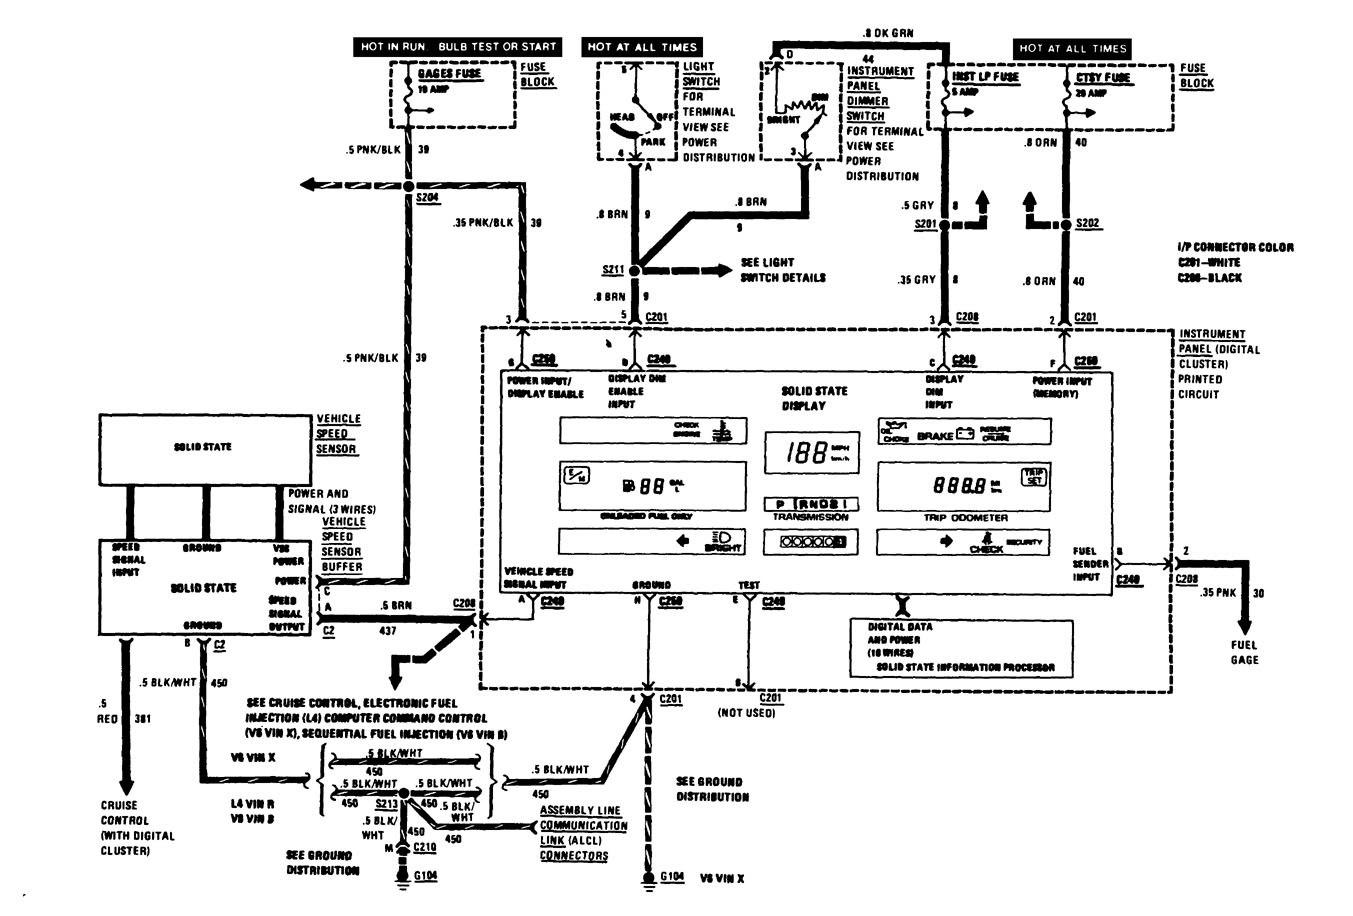 hight resolution of  buick century wiring diagram on 1995 buick century wiring diagram 1993 buick century wiring diagram